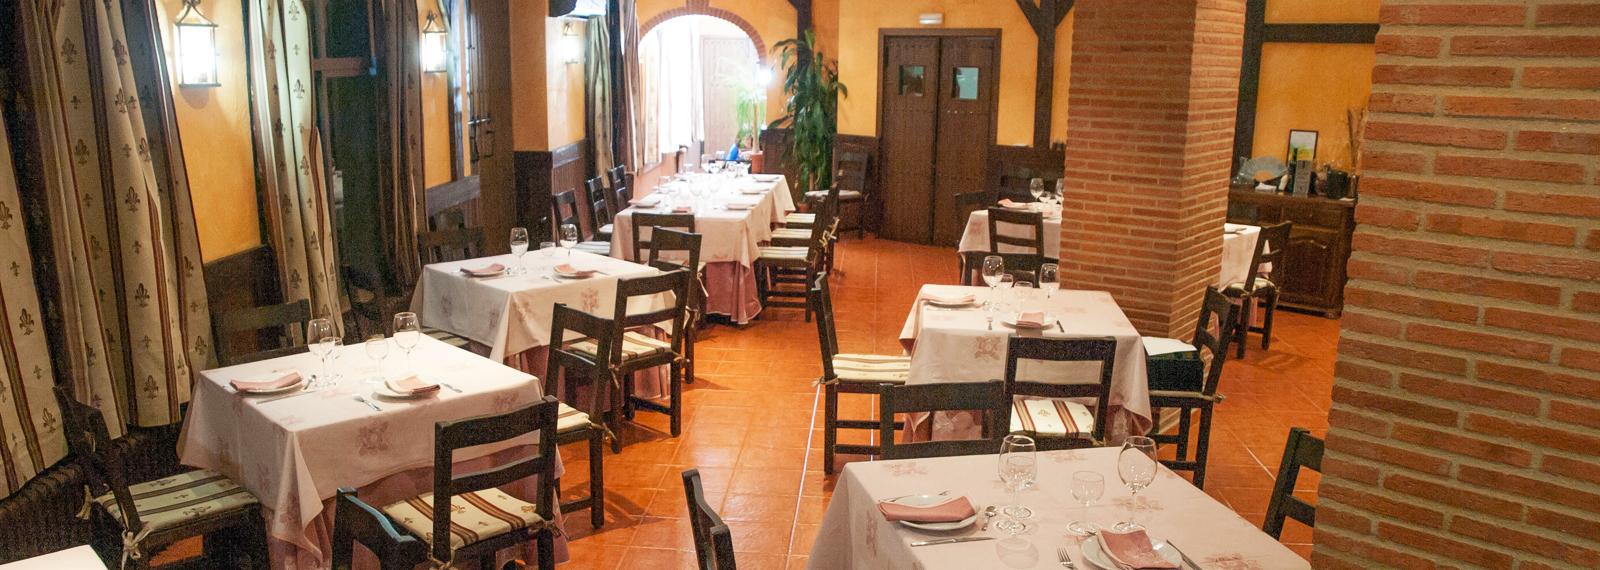 Restaurante Beatriz en Trujillo